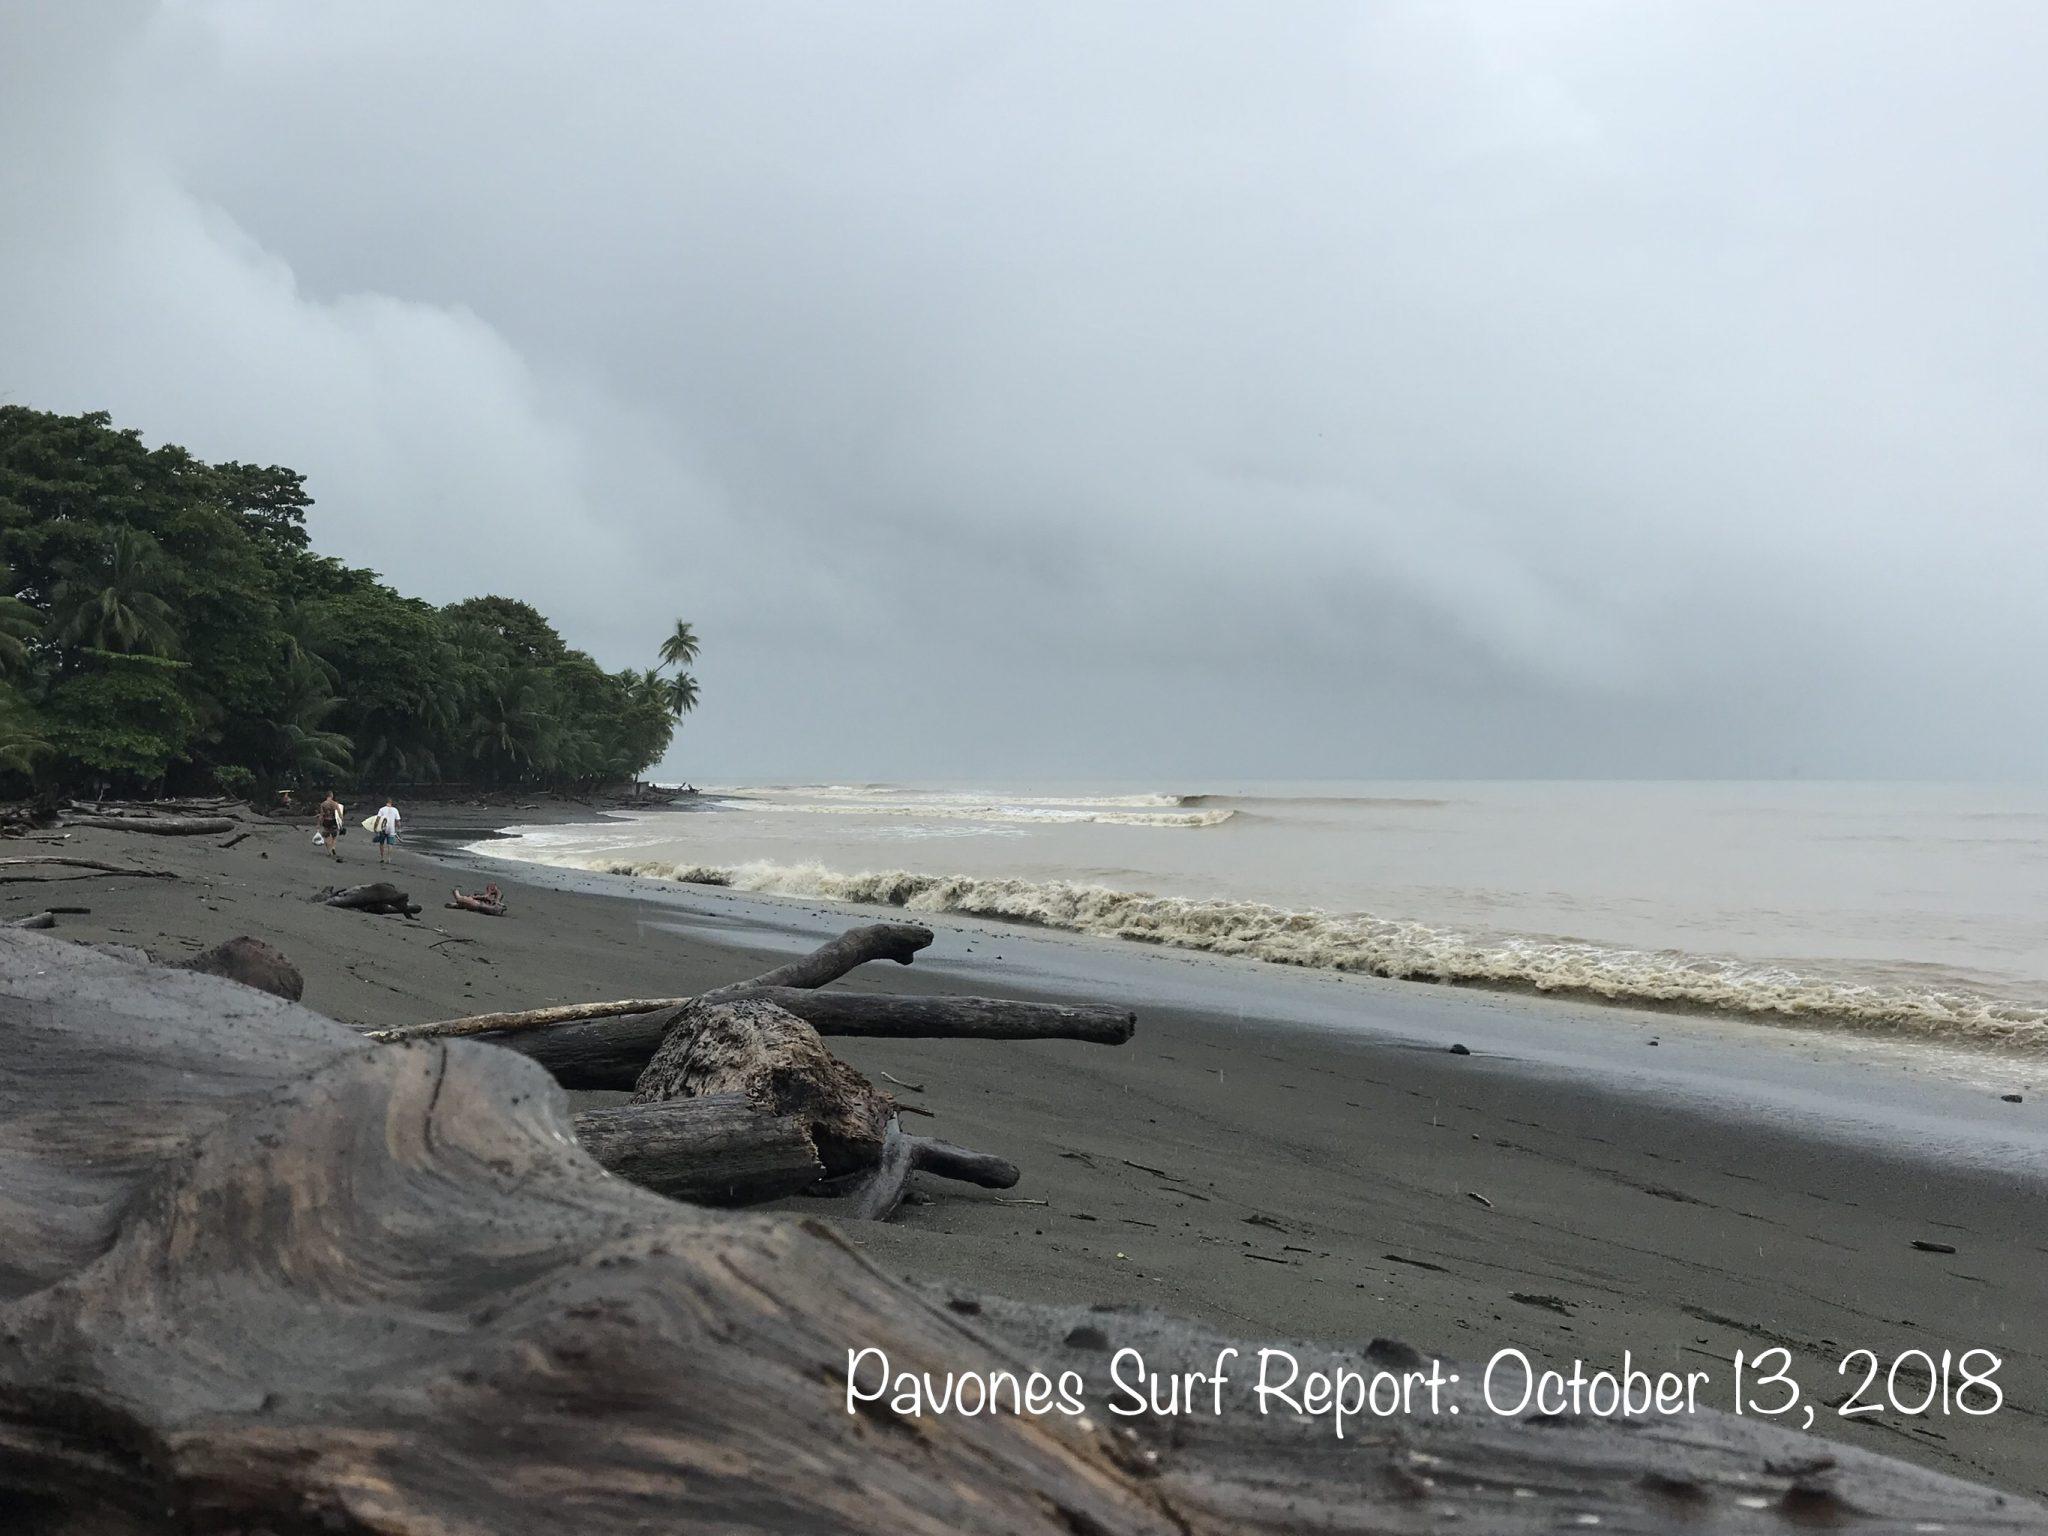 Pavon Surf Report